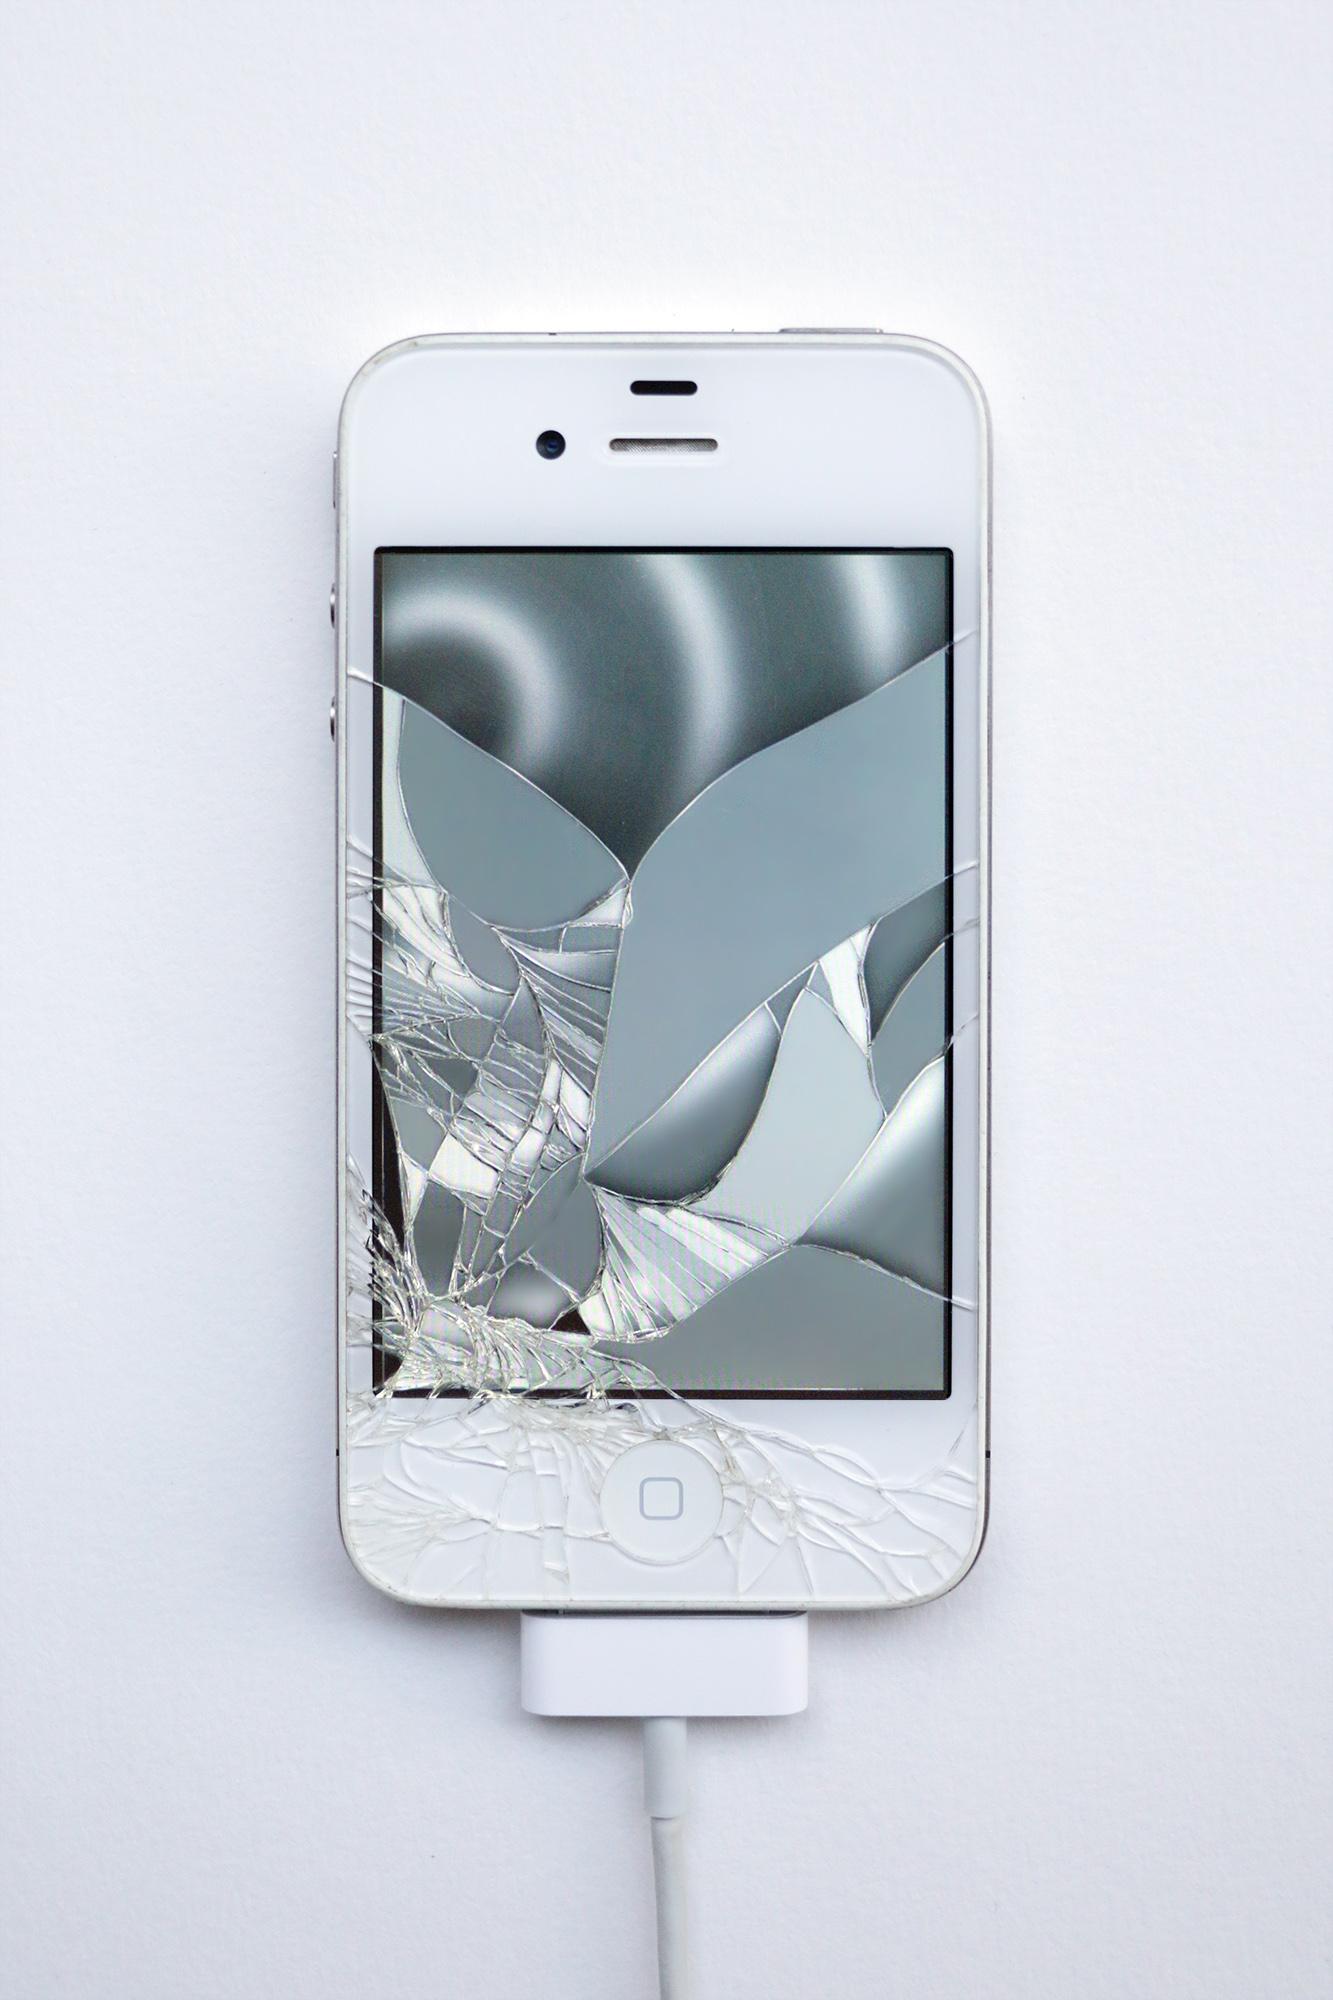 <em>Return of the Broken Screens (Apple iPhone 4 II)</em>, 2016.  Broken found smart phone, video, 4 3/4 x 2 1/4 inches